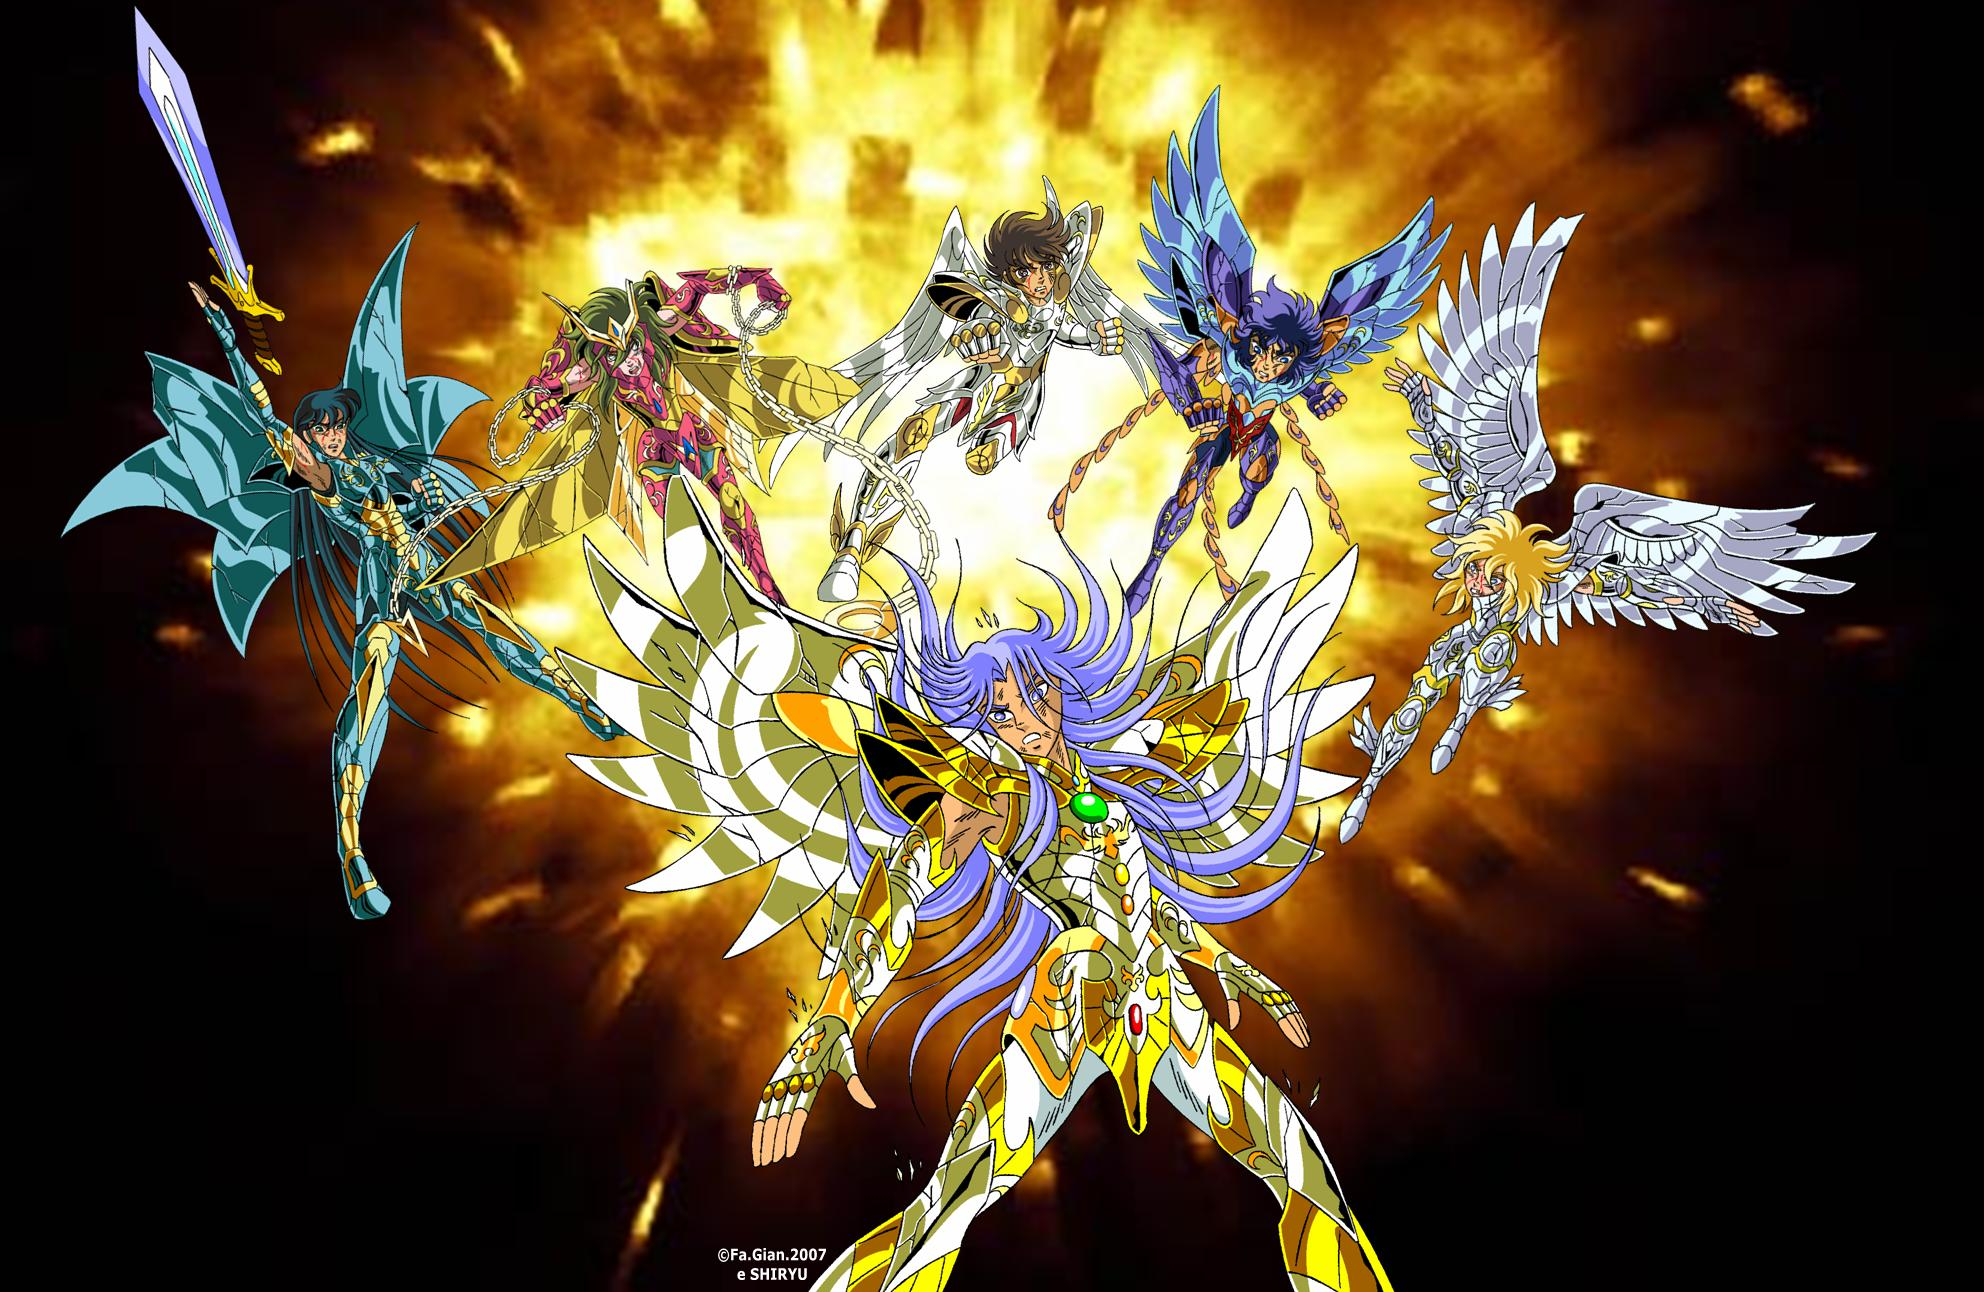 Gods | Fanfic characters | Fanarts by FaGian | Pharaon Website